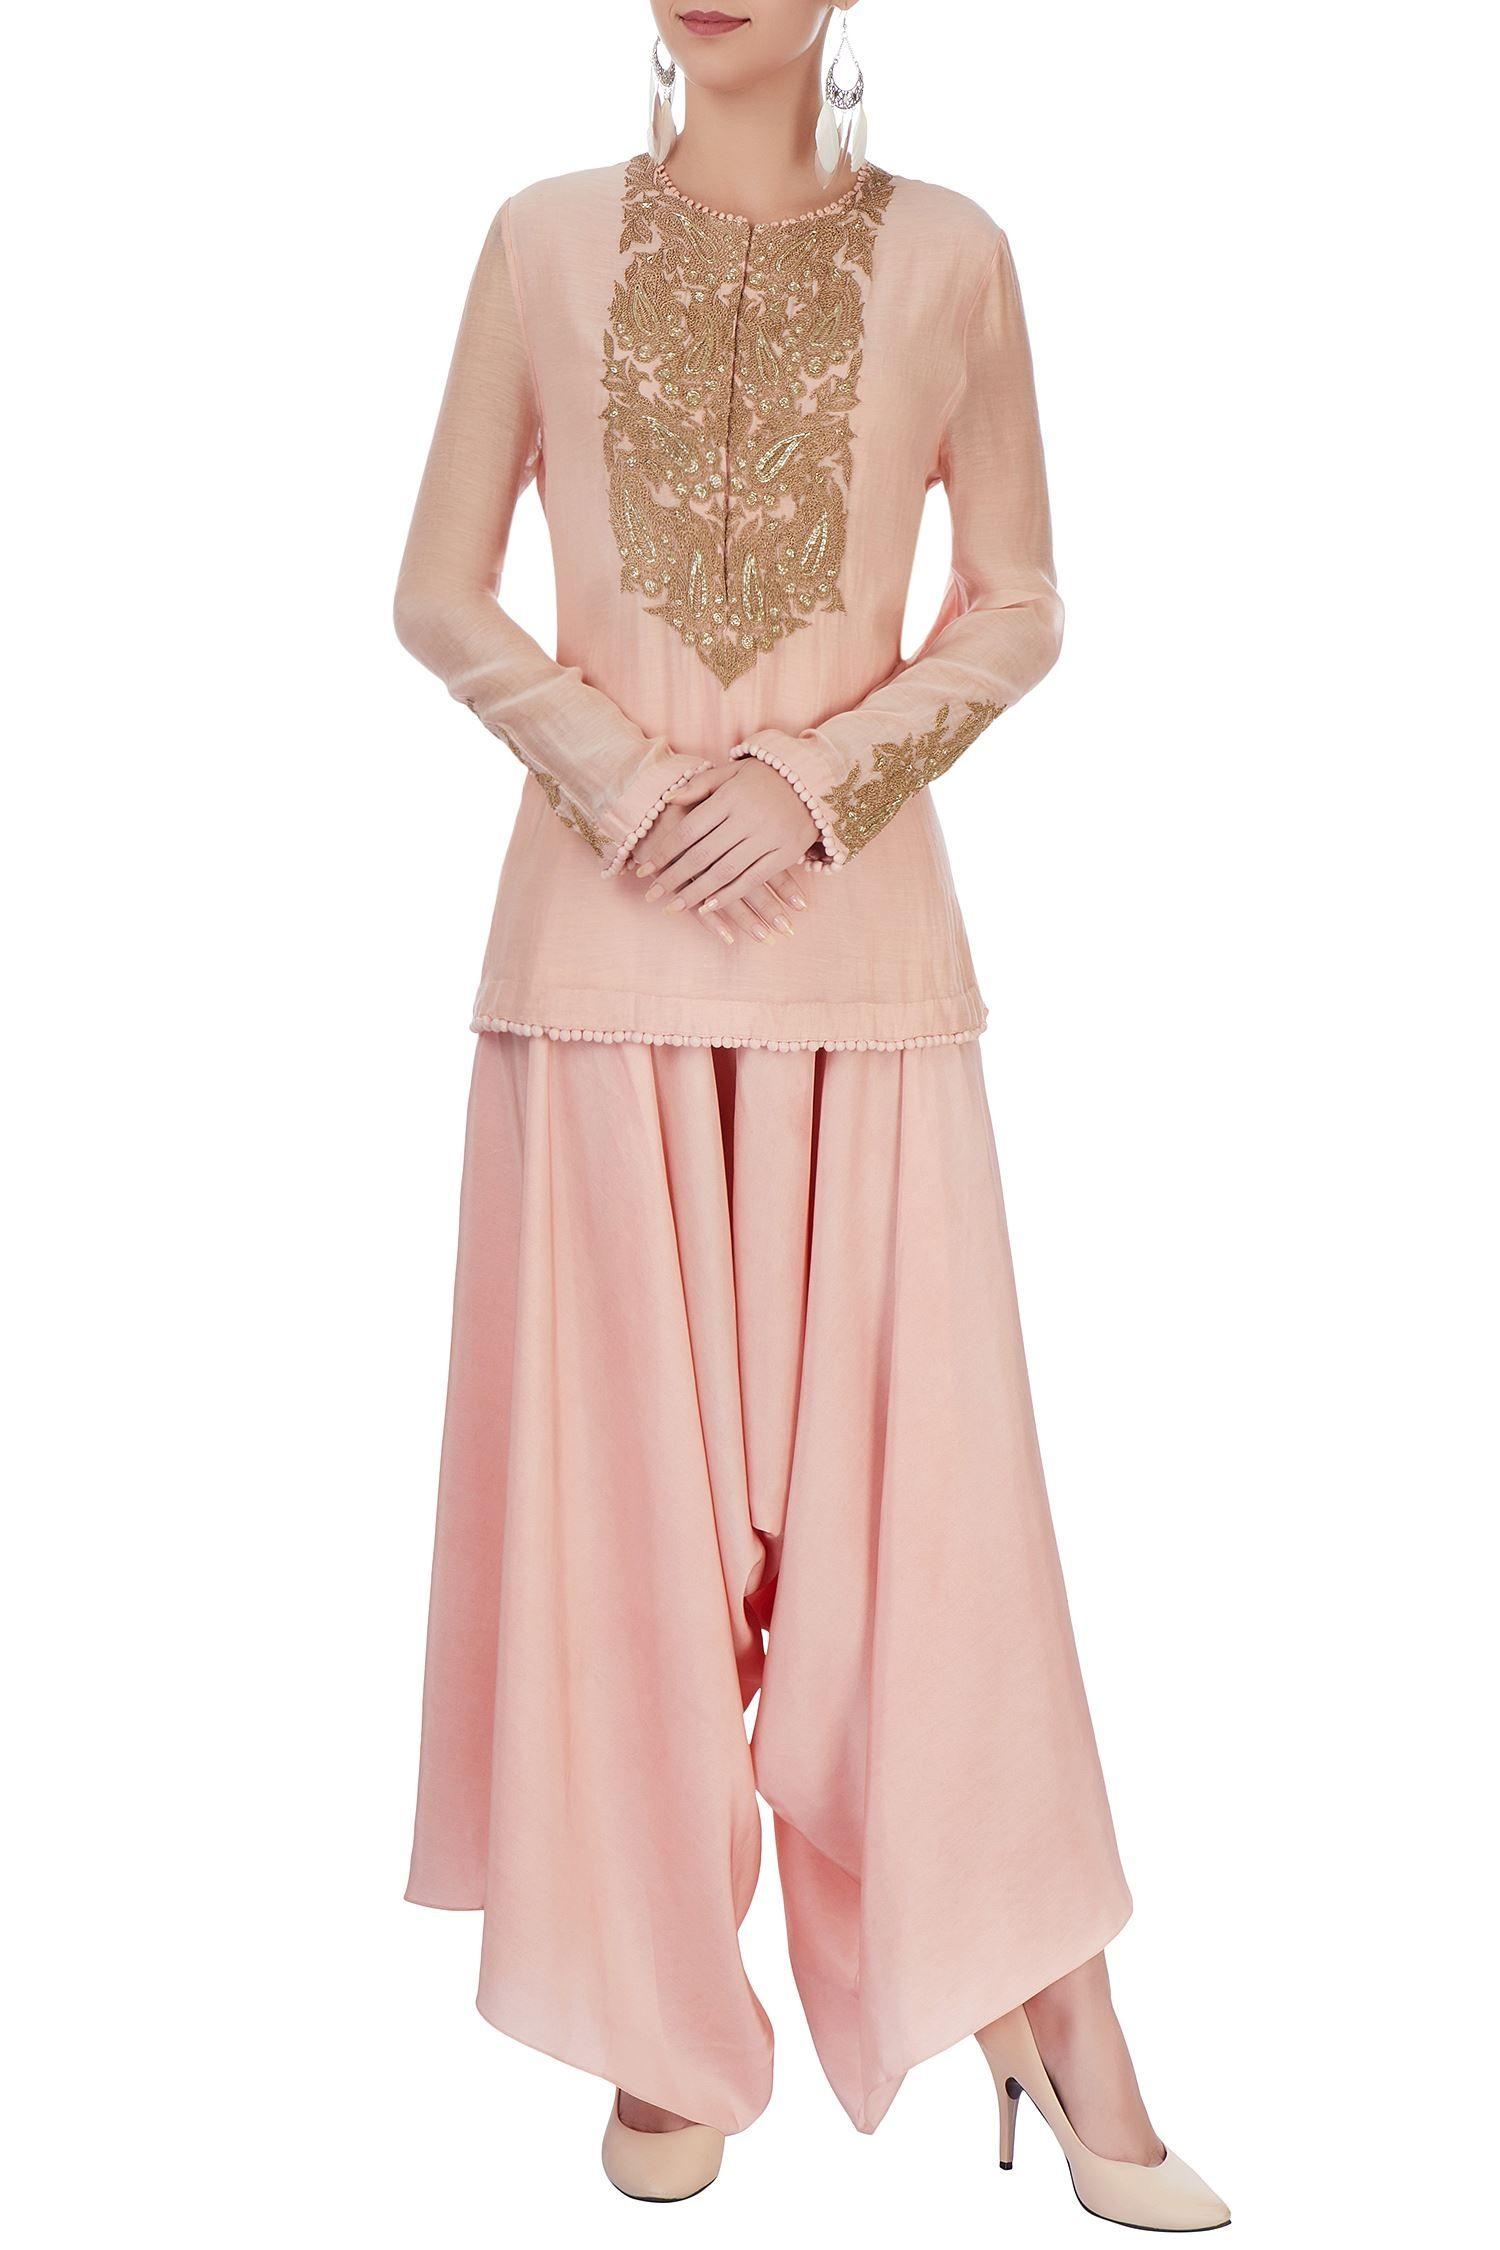 Blush pink kurta set with embroidery | shaba | Pinterest | Traje y ...